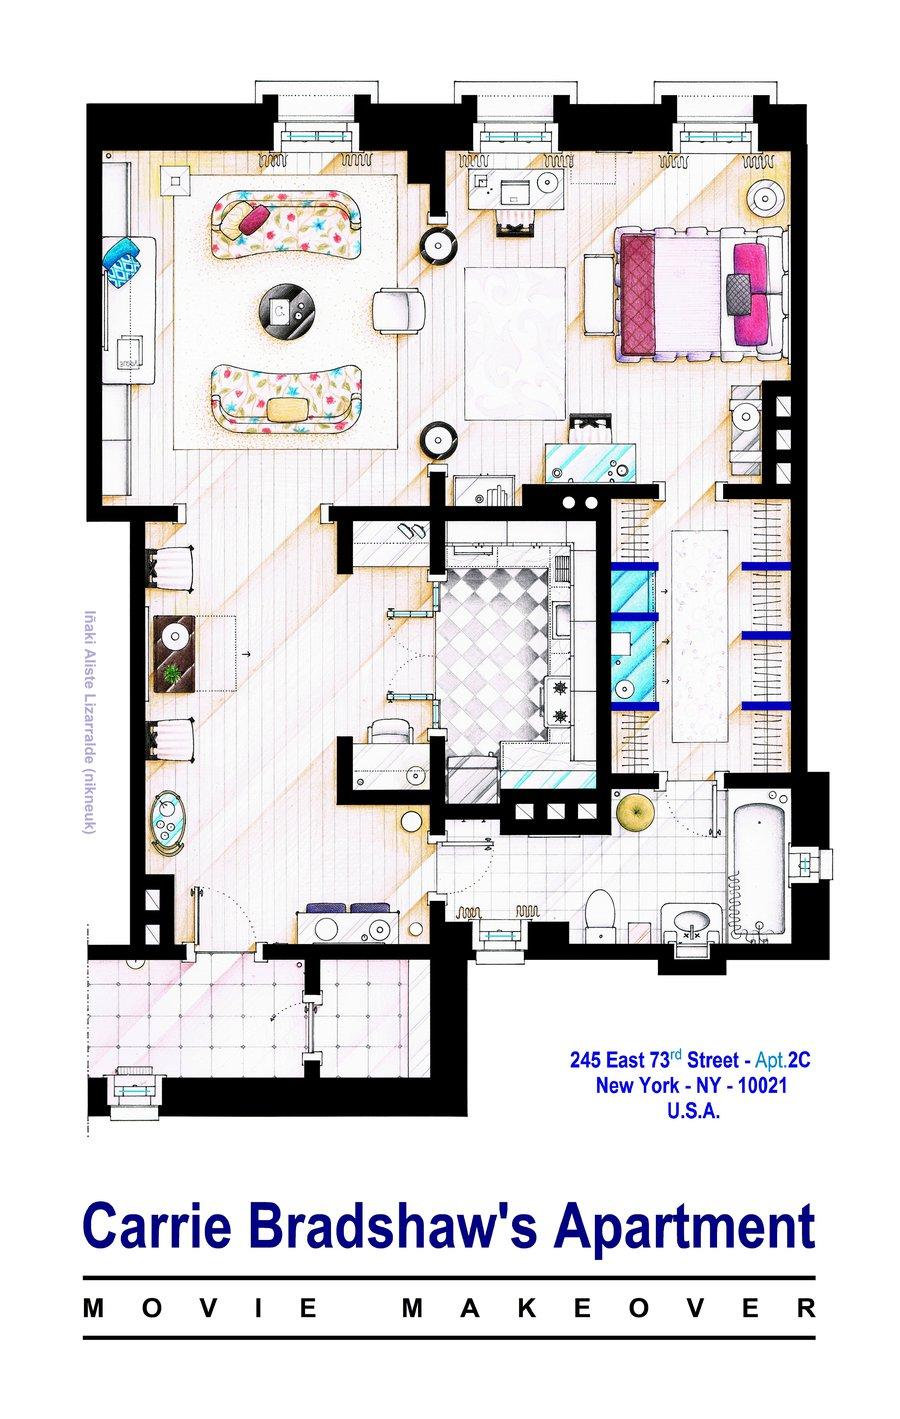 carry bradshaw apartment floorplan